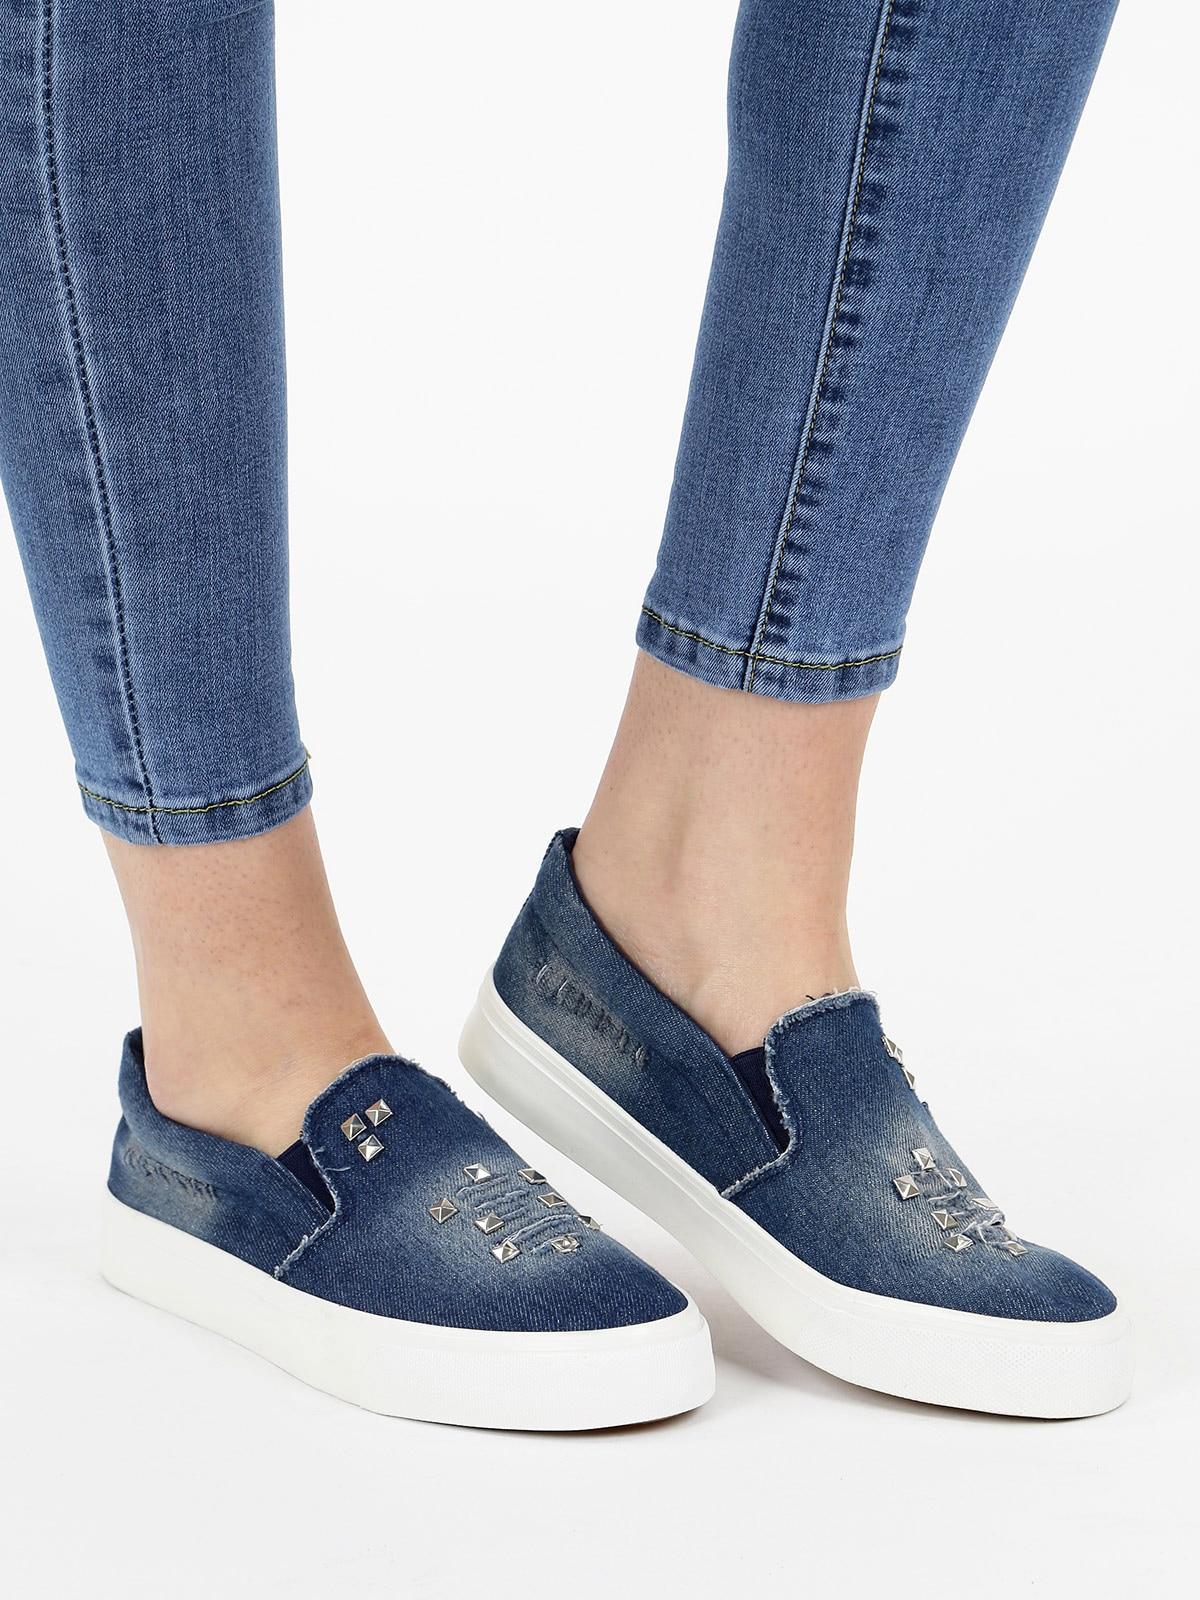 Woman Jean Blue Casual Skateboard Shoes Sport Shoes